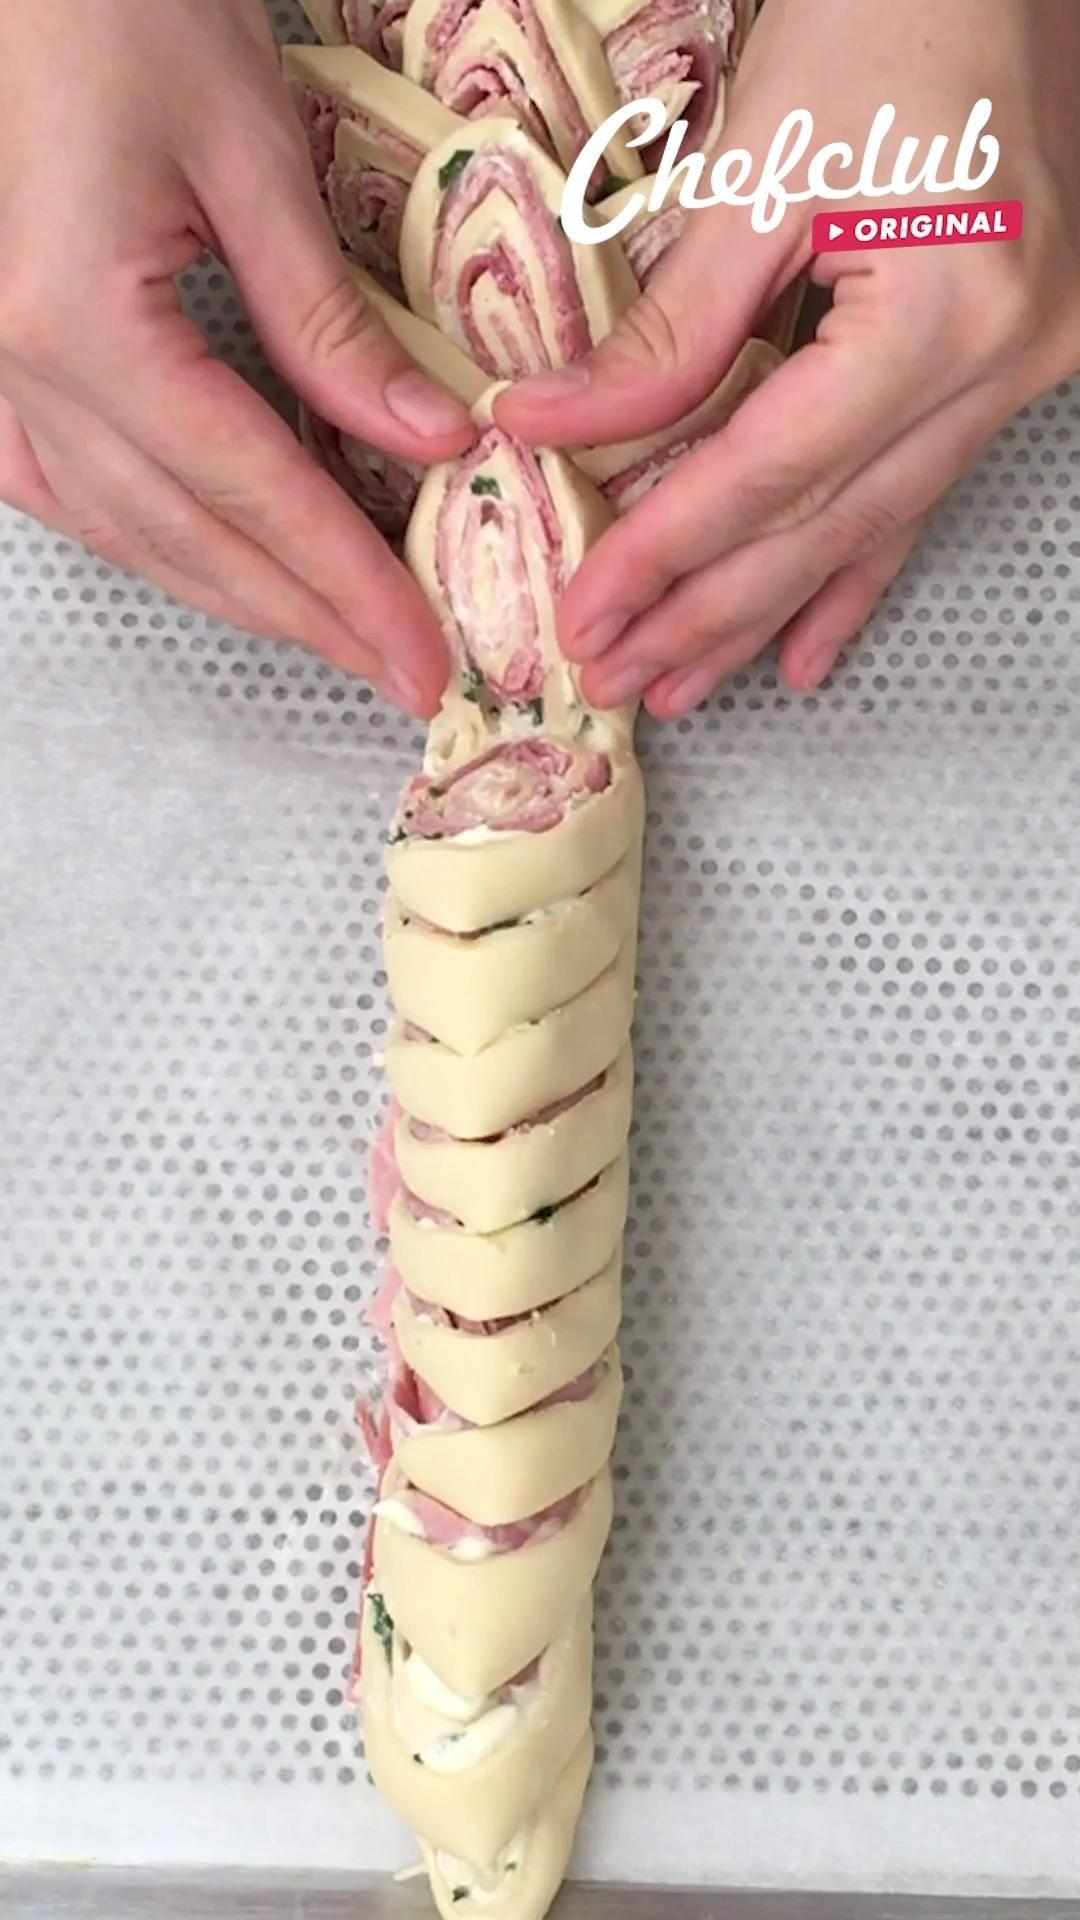 Käse-Schinken-Zopf